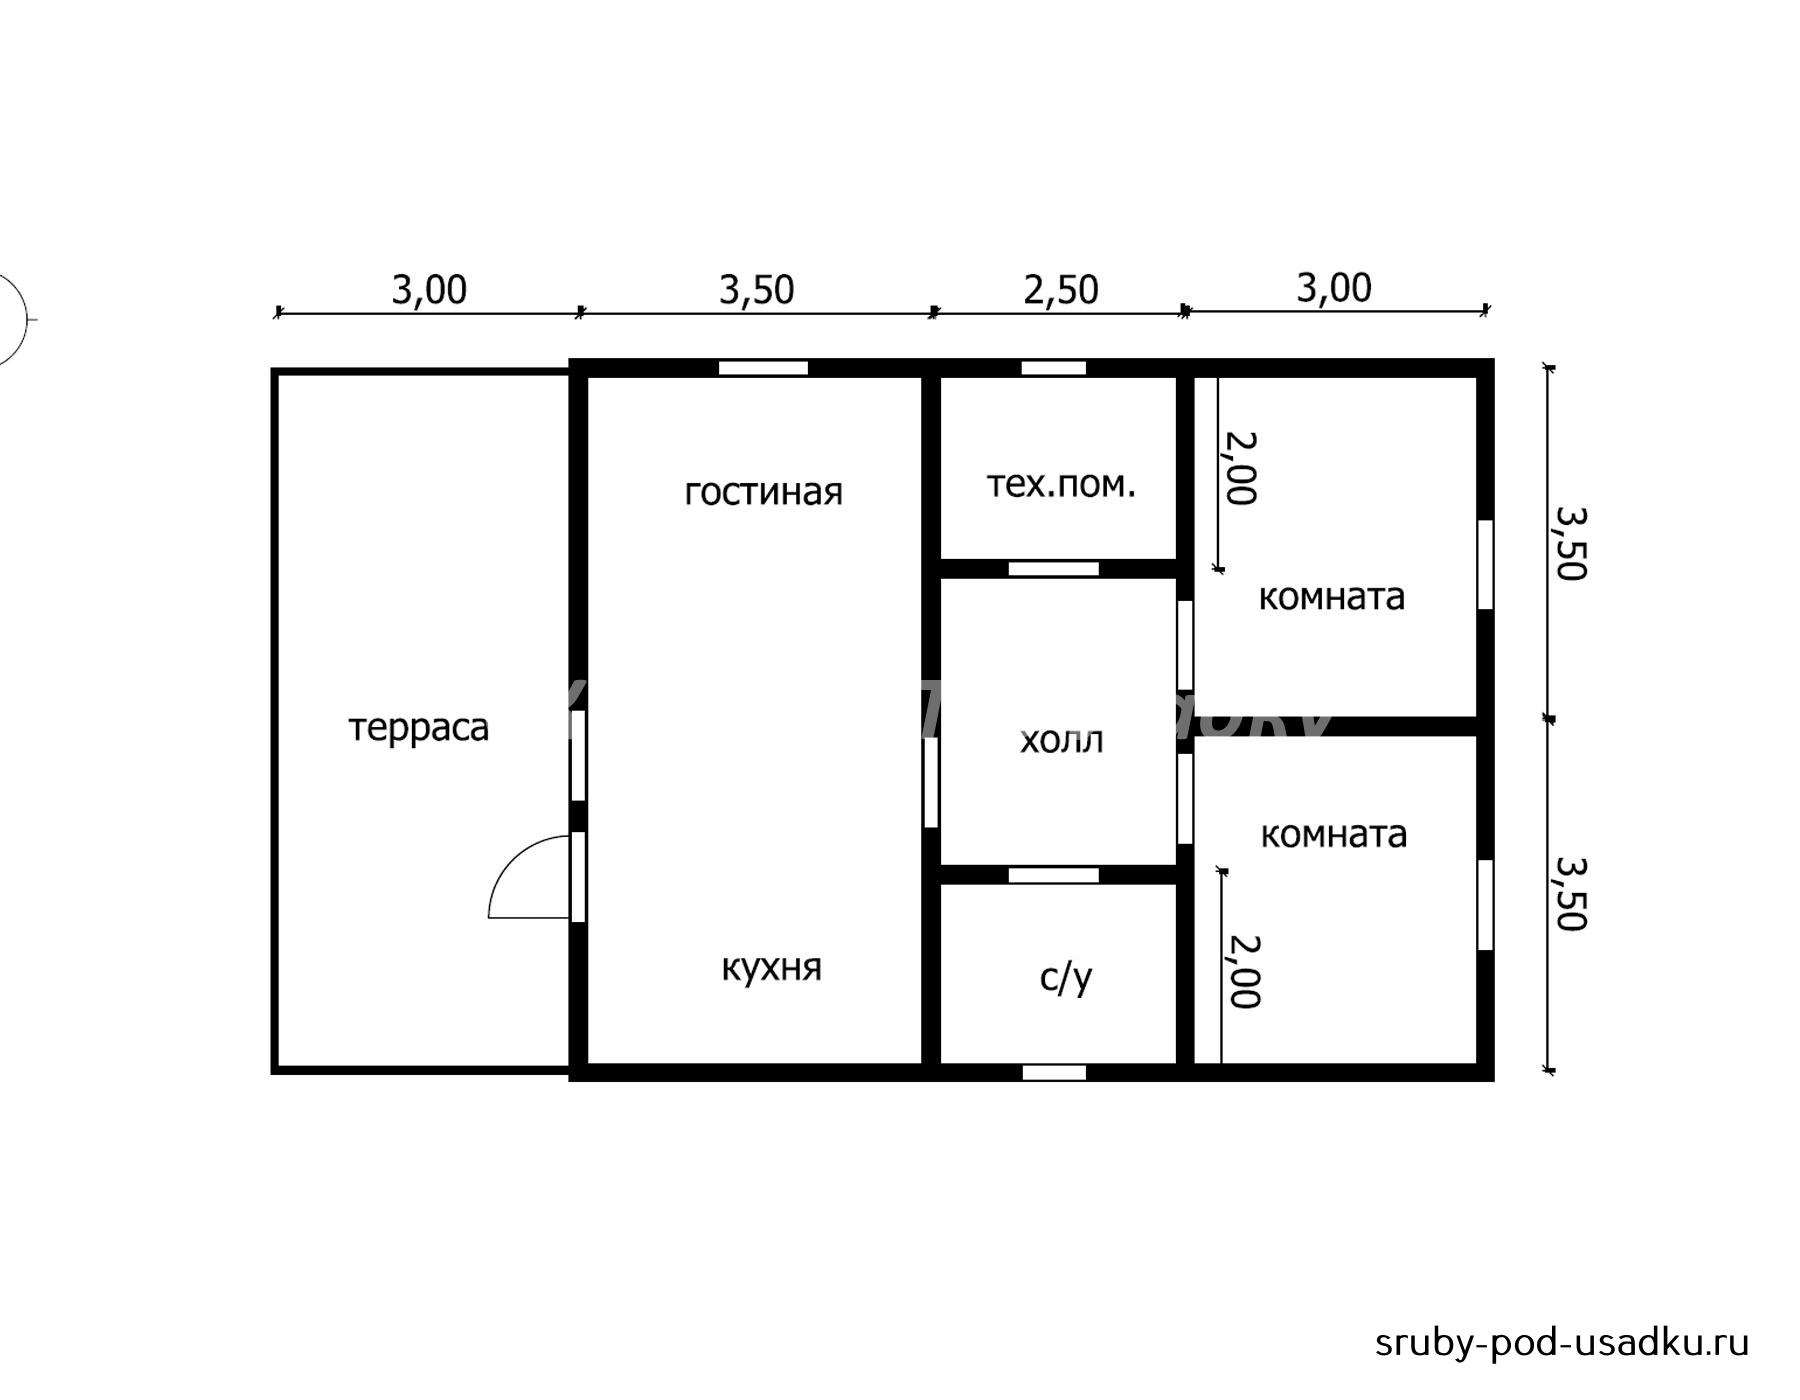 Дом из бруса под усадку 8х10 №21